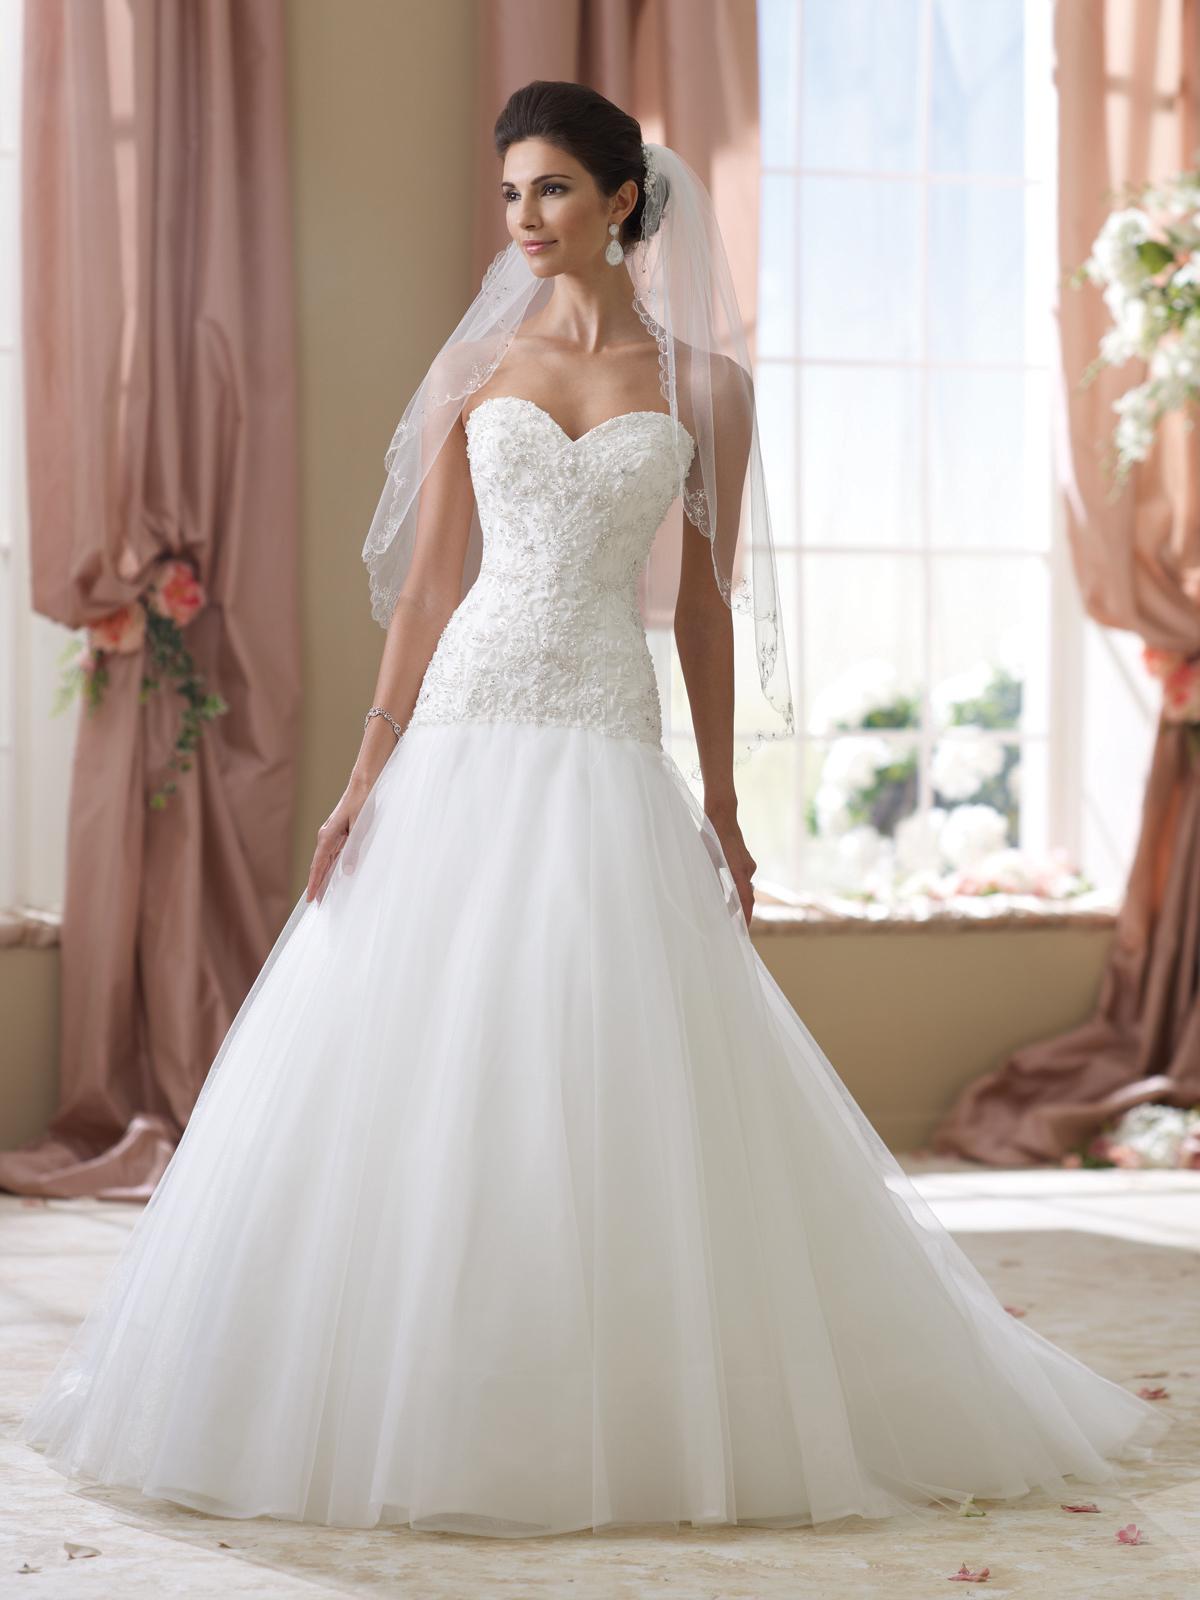 Wedding Dresses For   Sunshine Coast : Cora sunshine coast wedding dresses